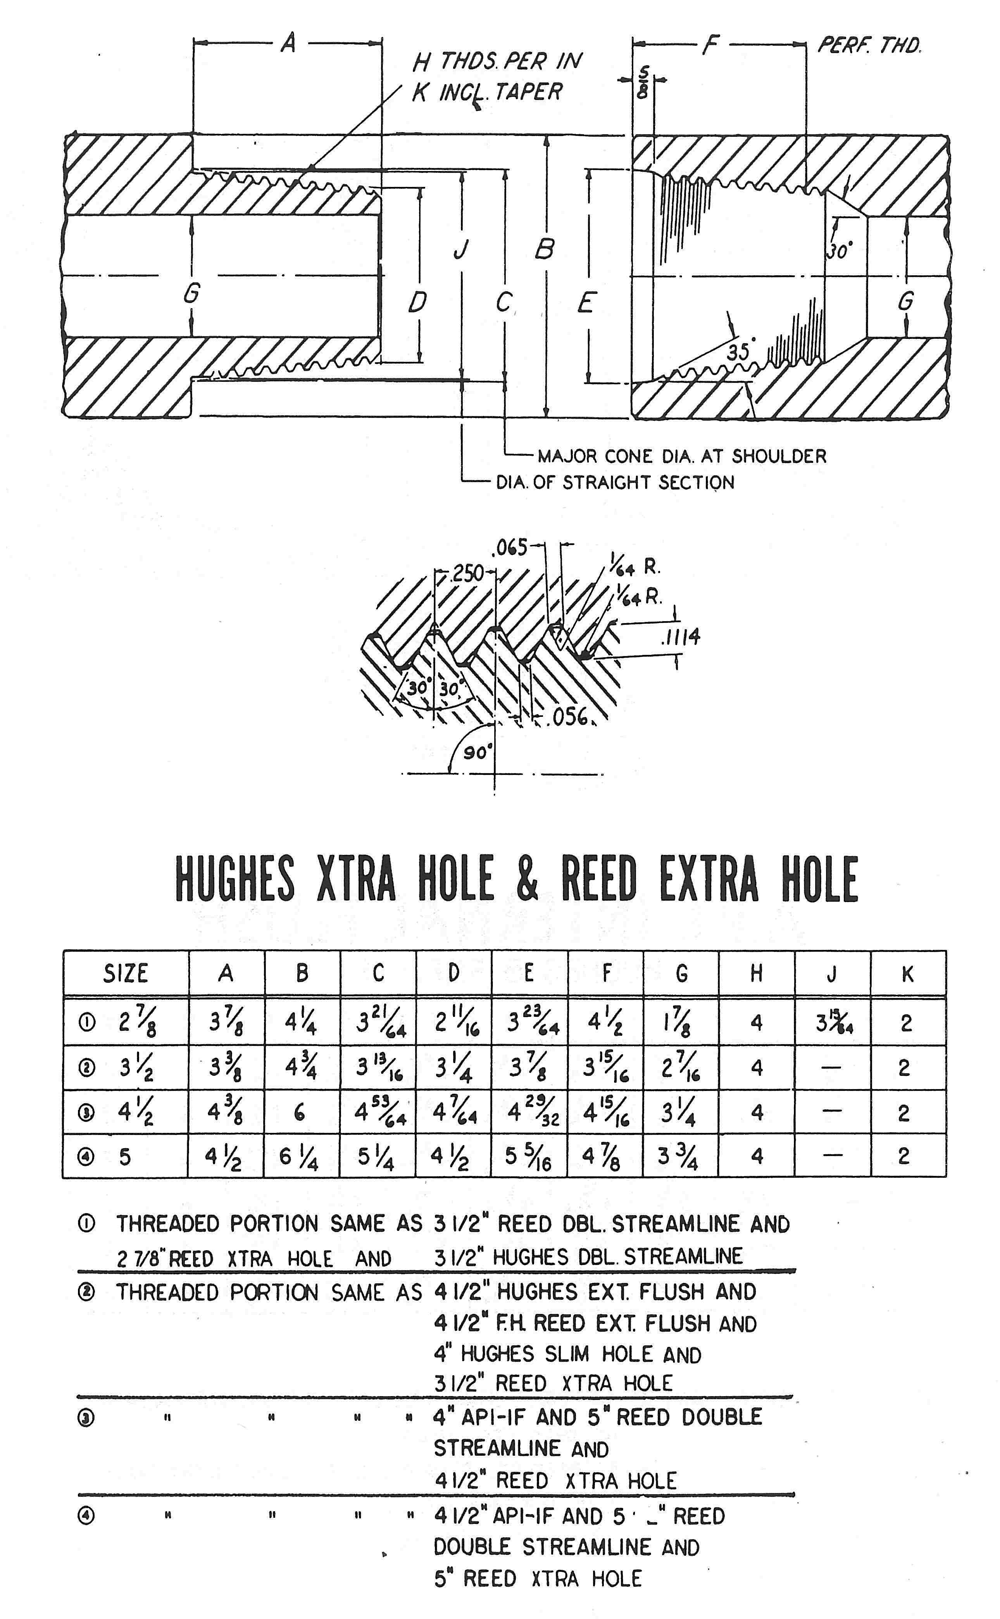 Oilfield Wiring Diagrams : Oilfield tubing connection diagram diy enthusiasts